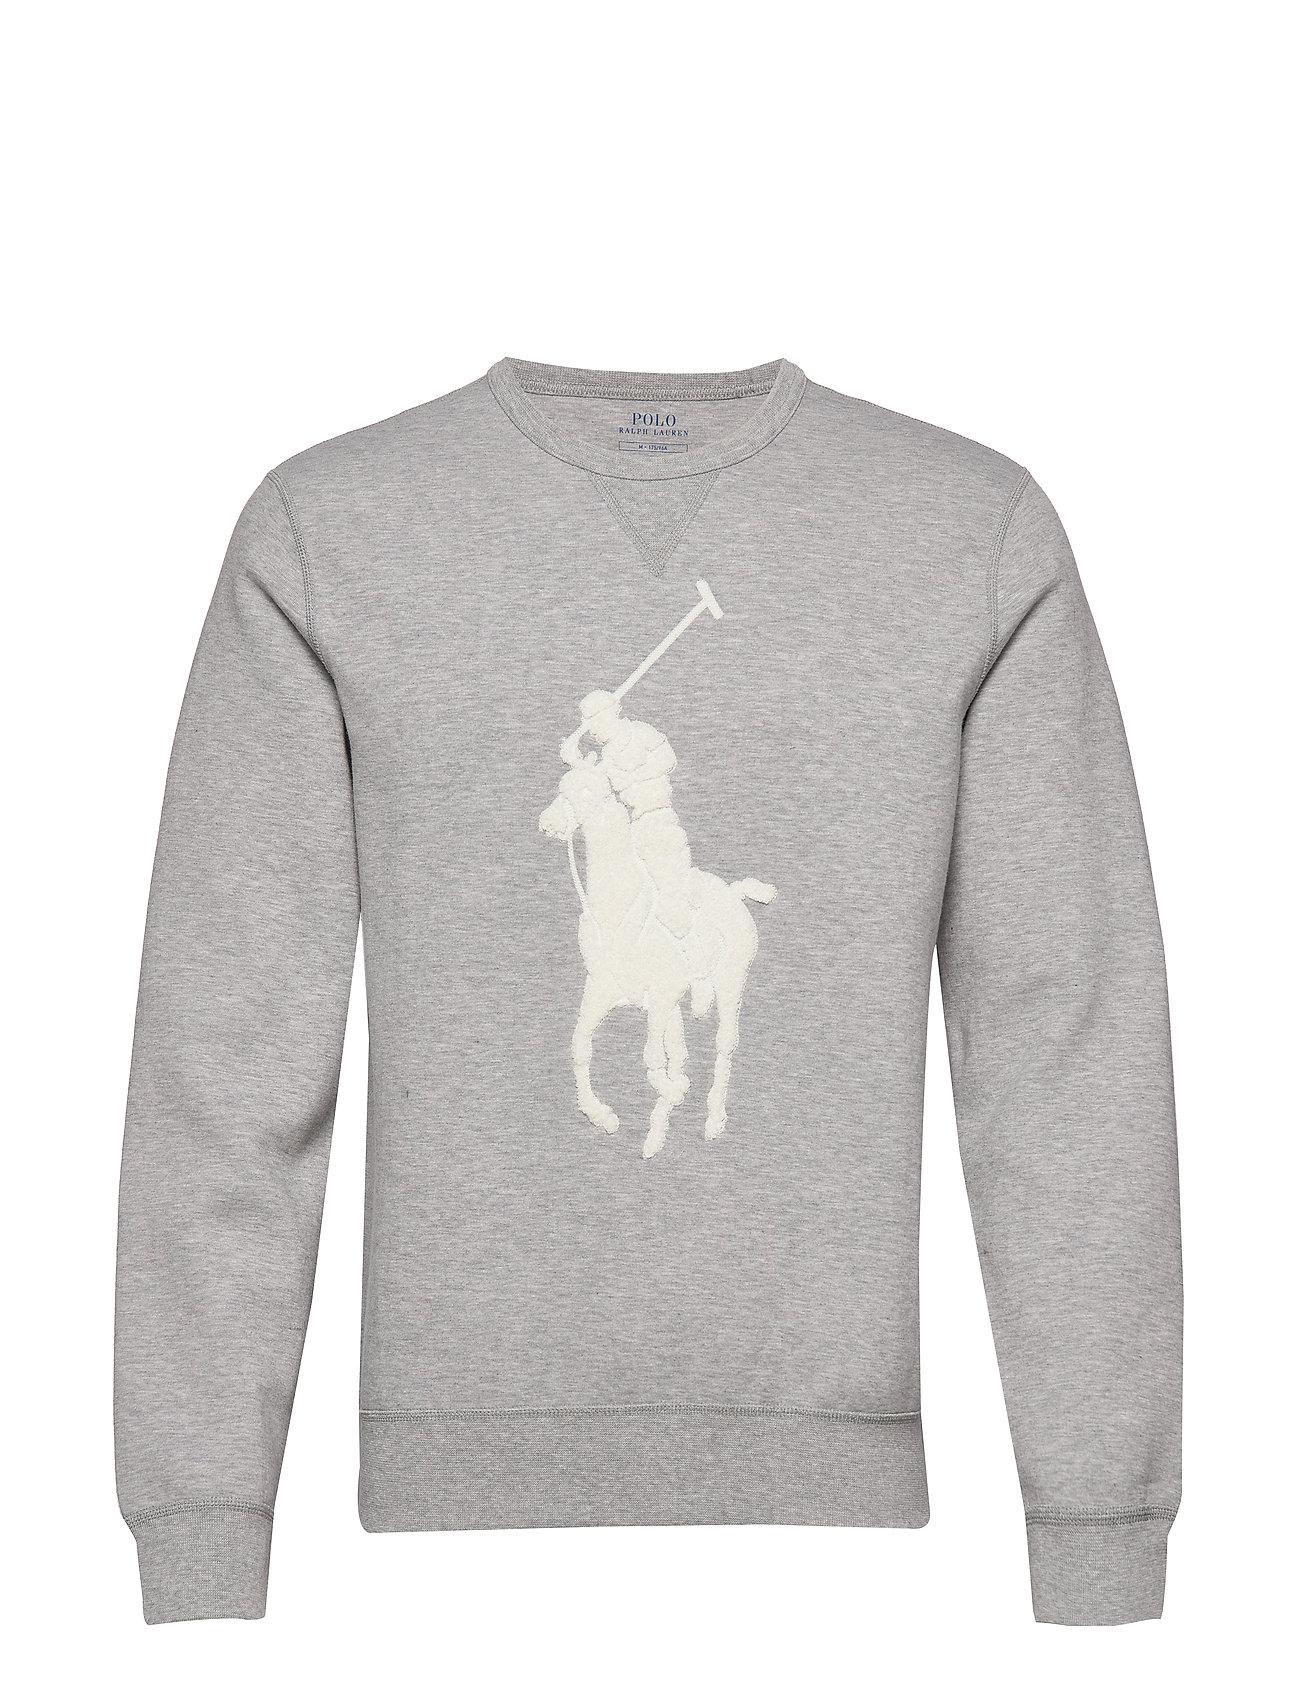 Polo Ralph Lauren Big Pony Sweatshirt - ANDOVER HEATHER